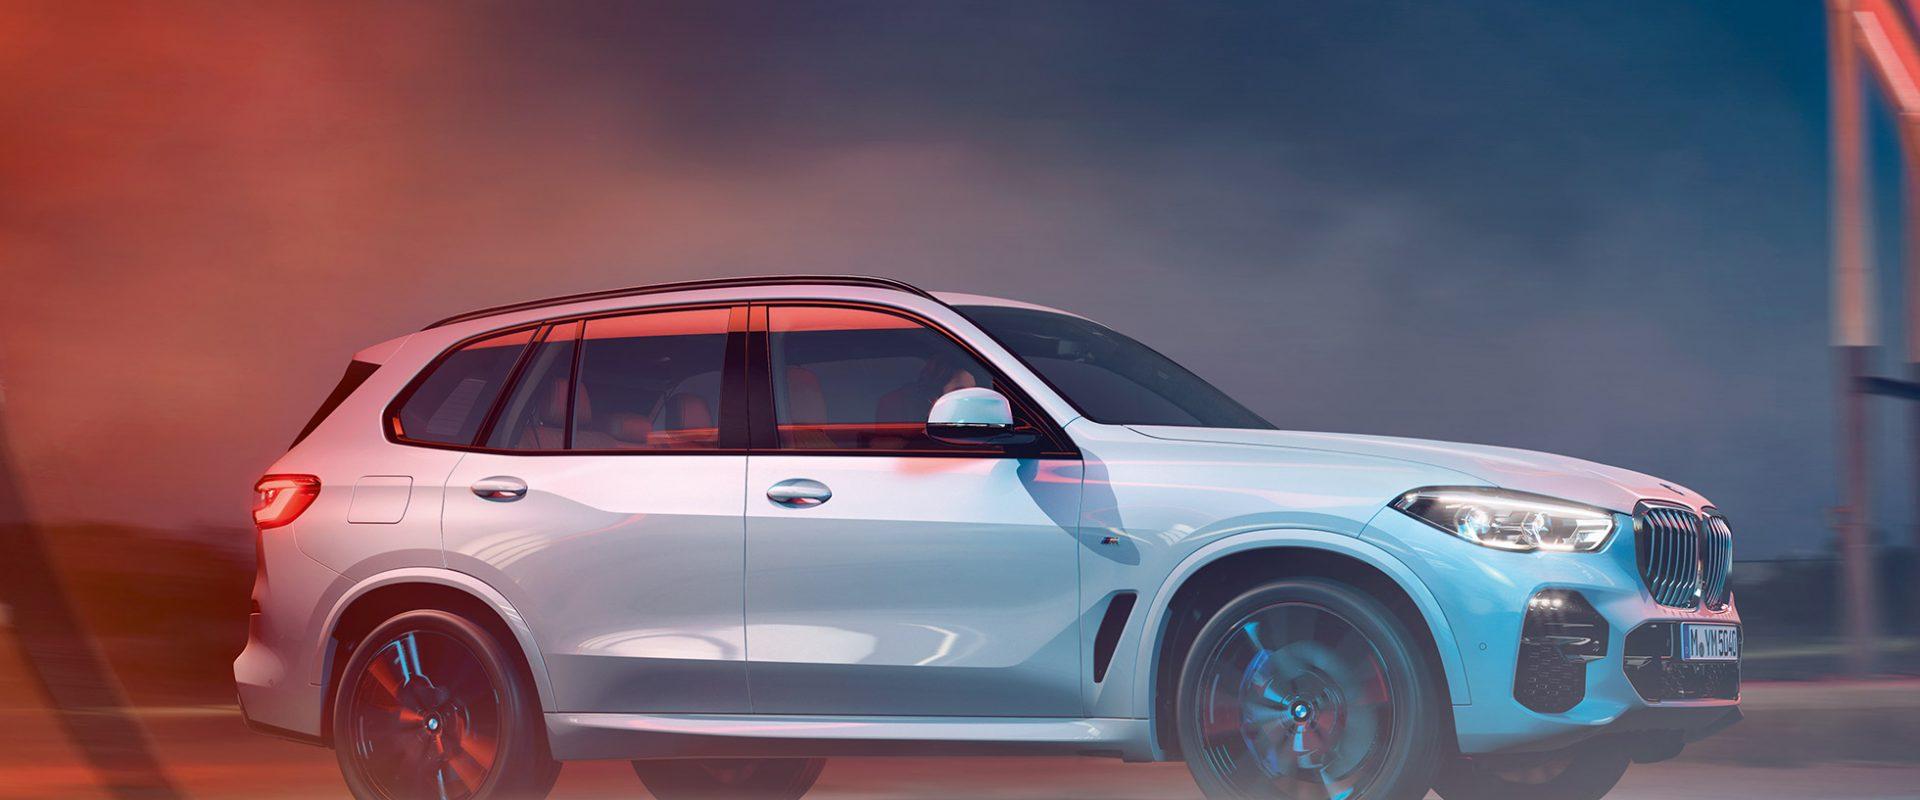 Conheça os 9 principais modelos de carros importados de luxo!